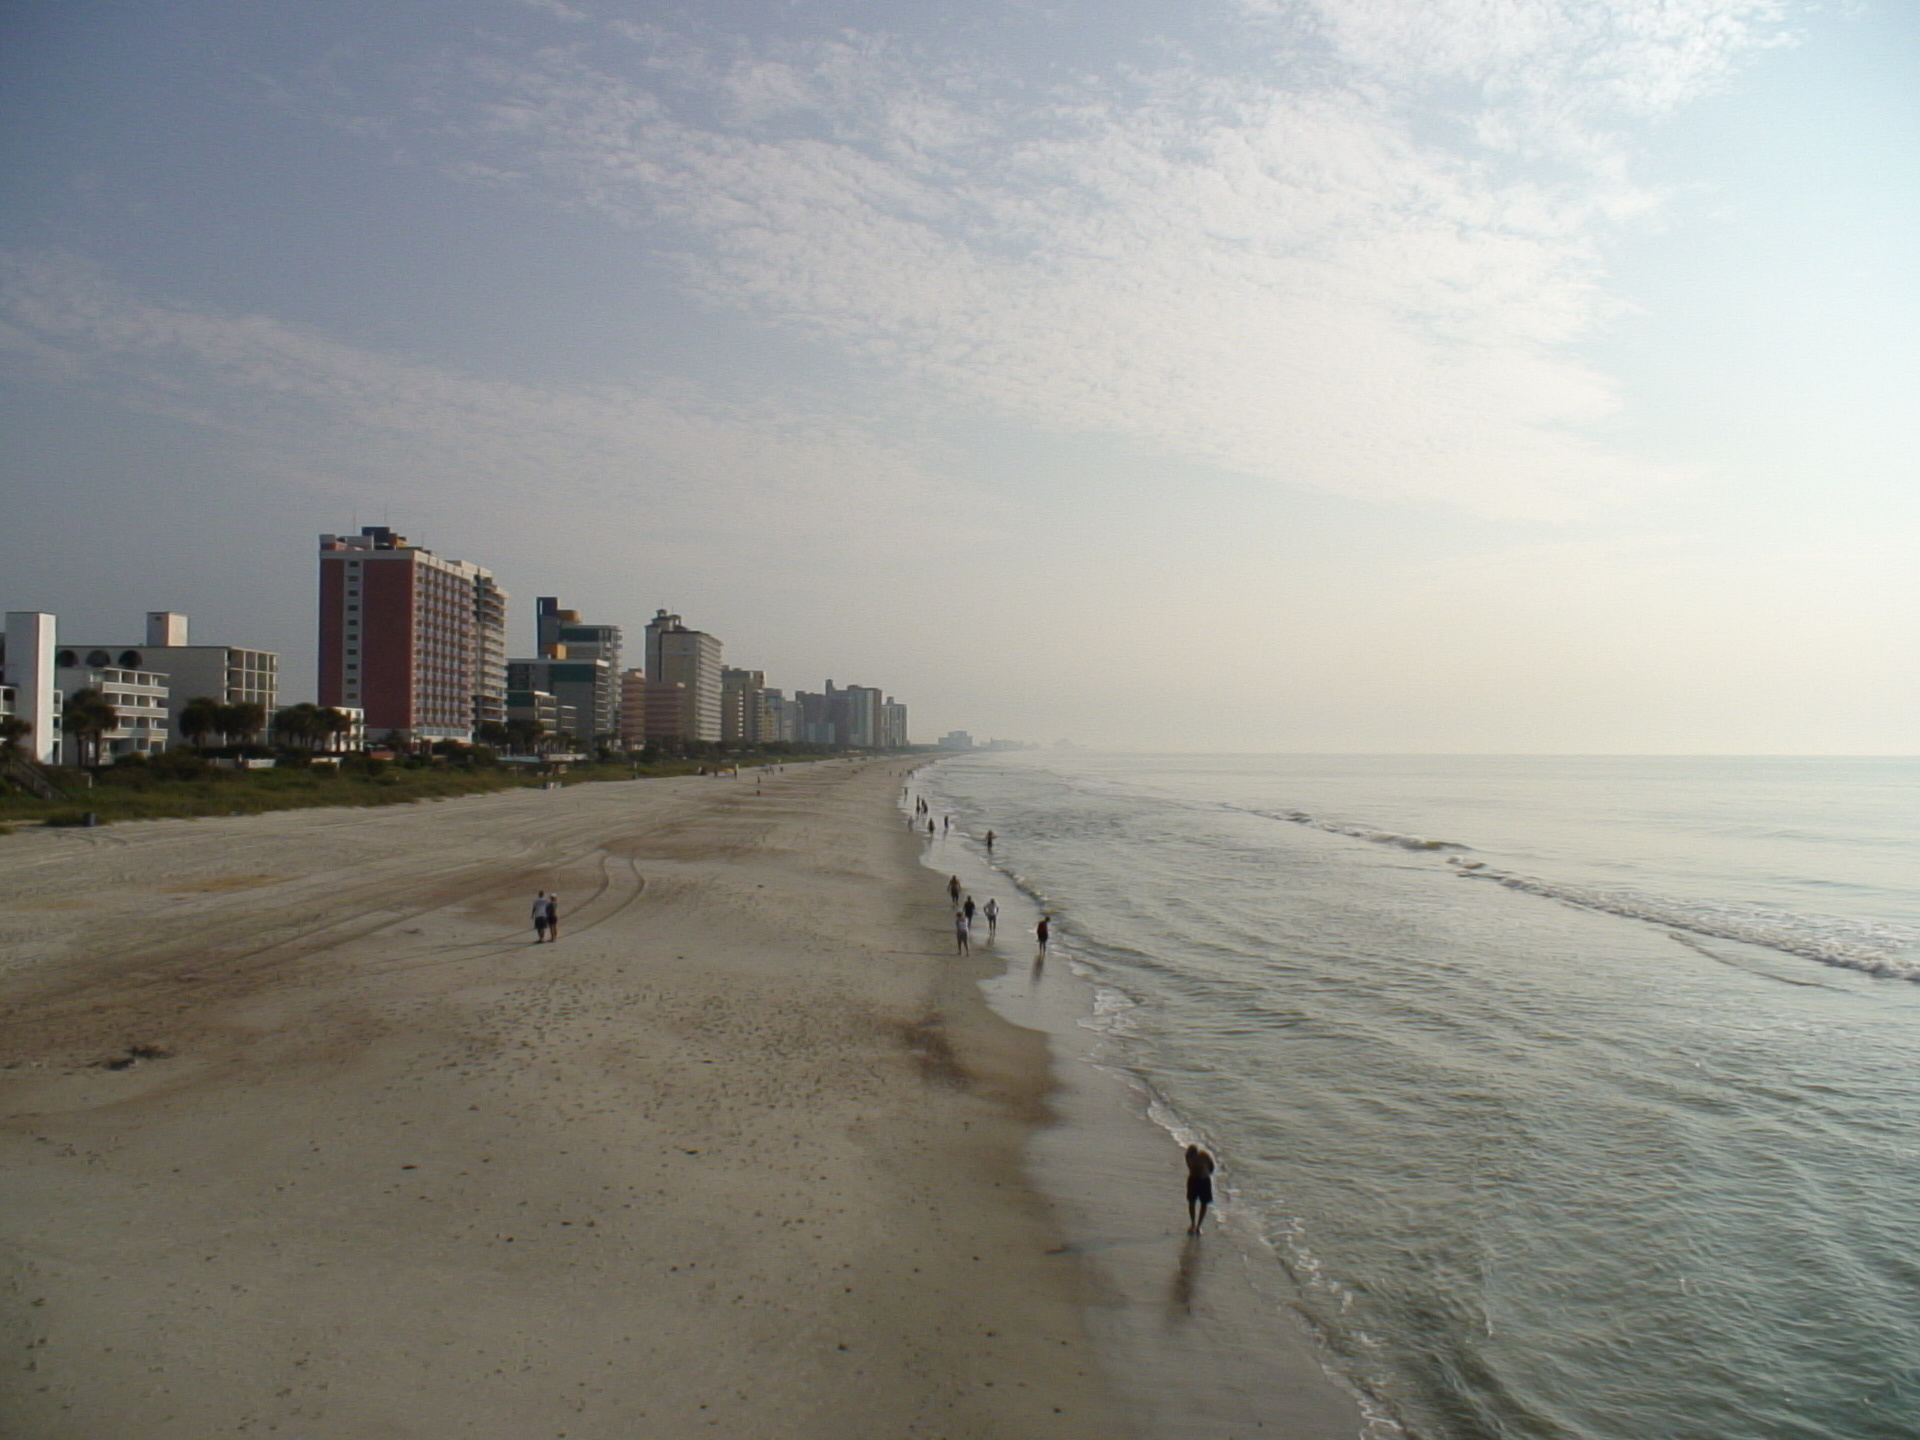 Myrtle Beach in South Carolina